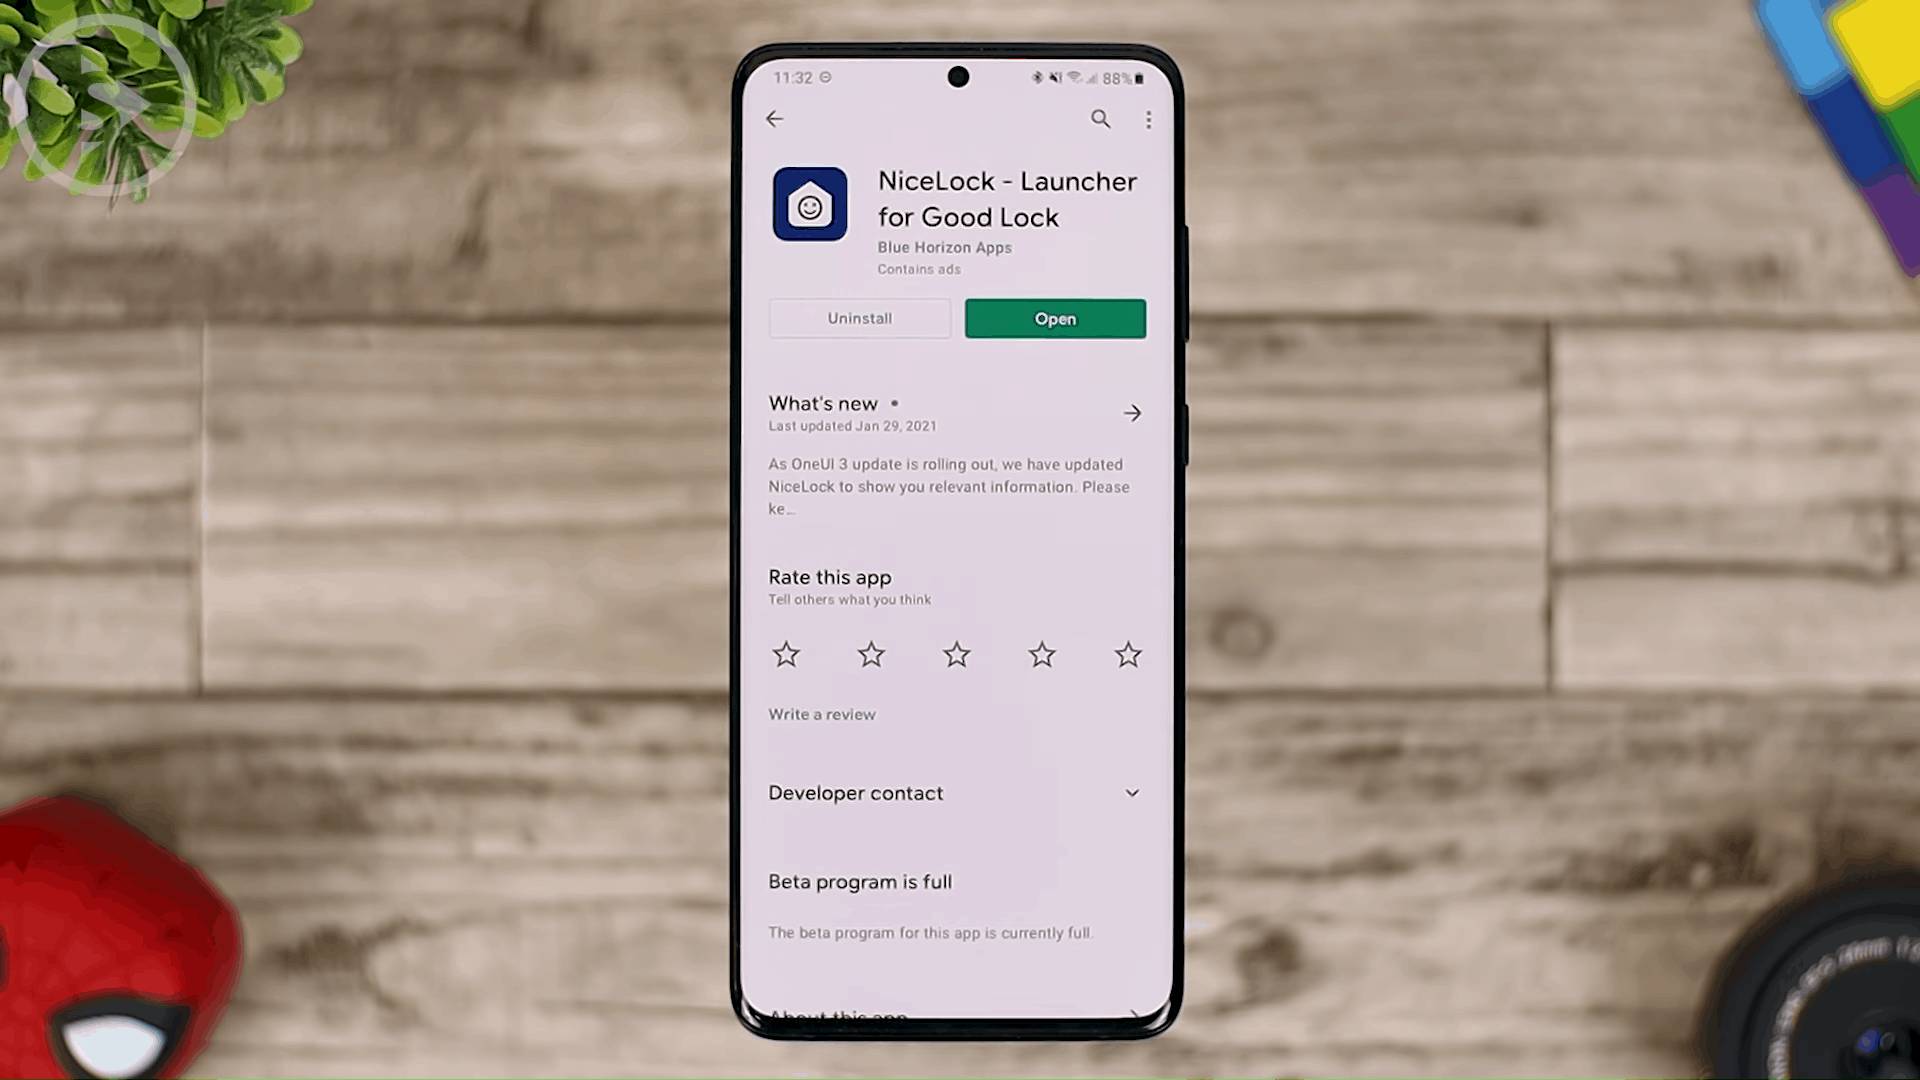 NiceLock App - Tips Lengkap Cara Install GoodLock Terbaru 2021